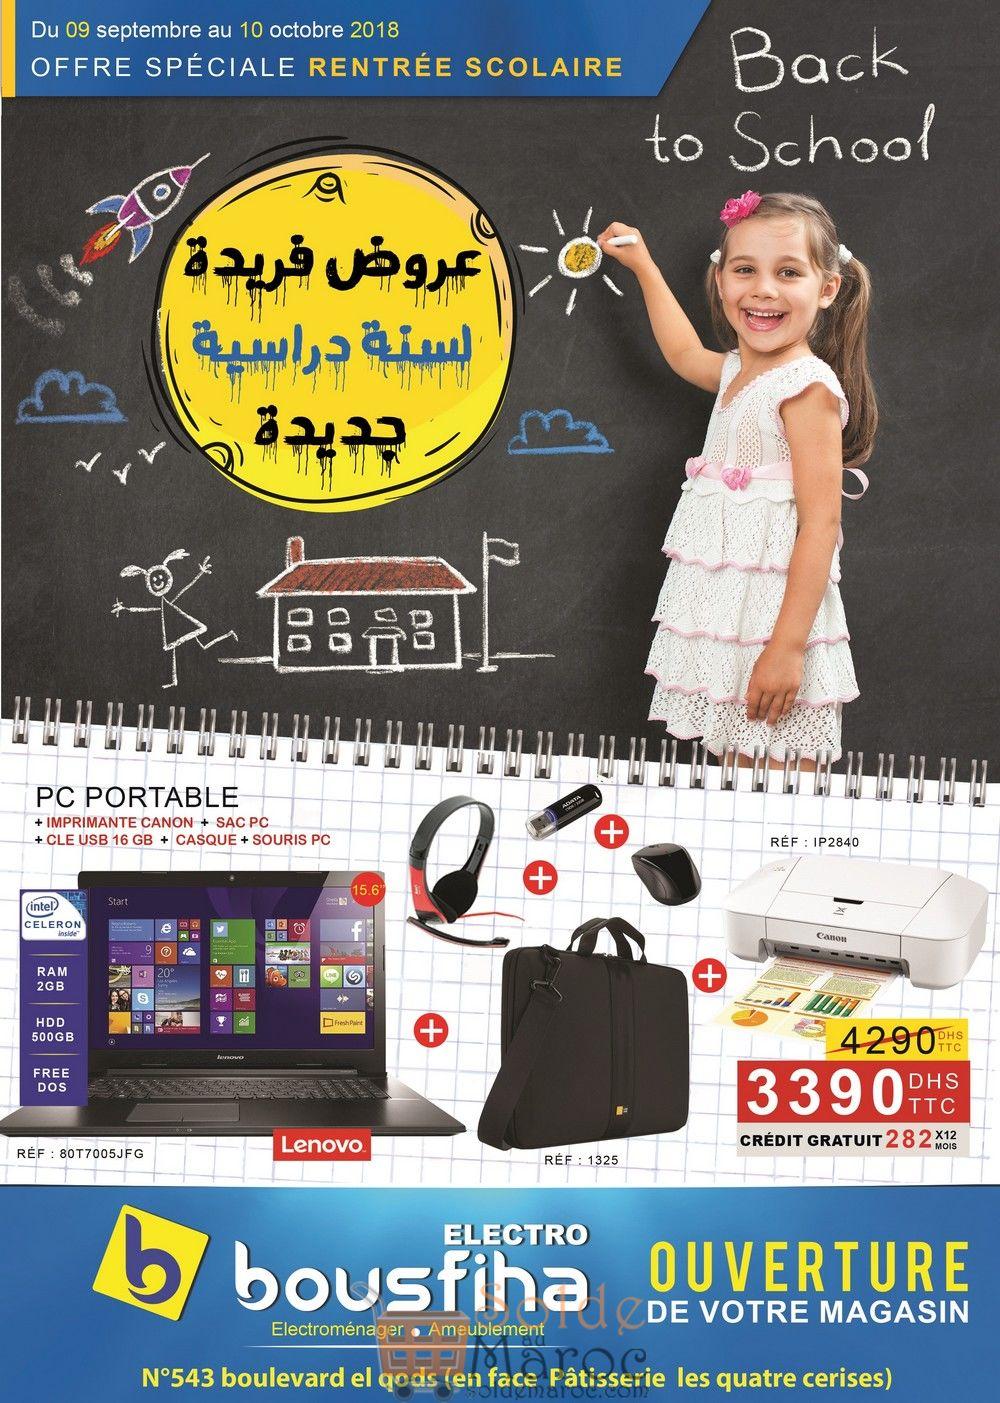 Catalogue Electro Bousfiha Back to School du 9 Septembre au 10 Octobre 2018